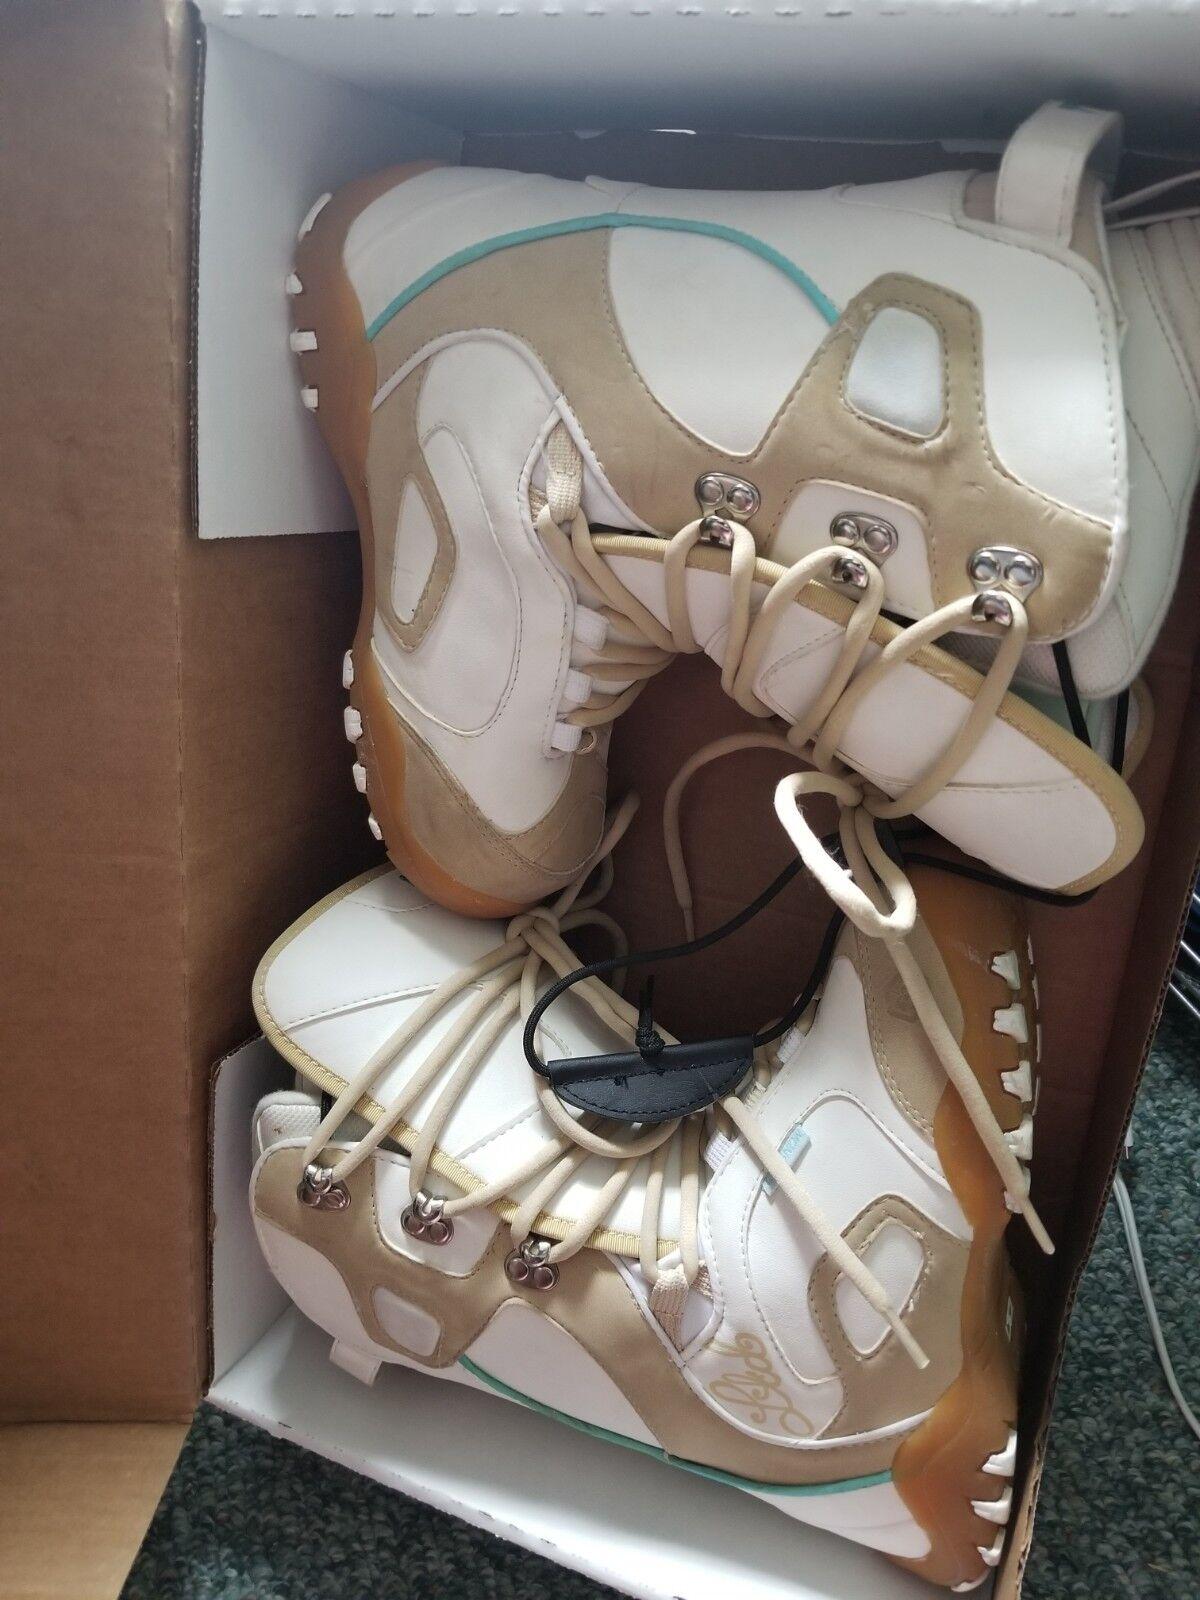 LTD Women's Snowboard Winter Boots Sz Us 7 Eur 37.5 Brown  White Mountain Lac Up